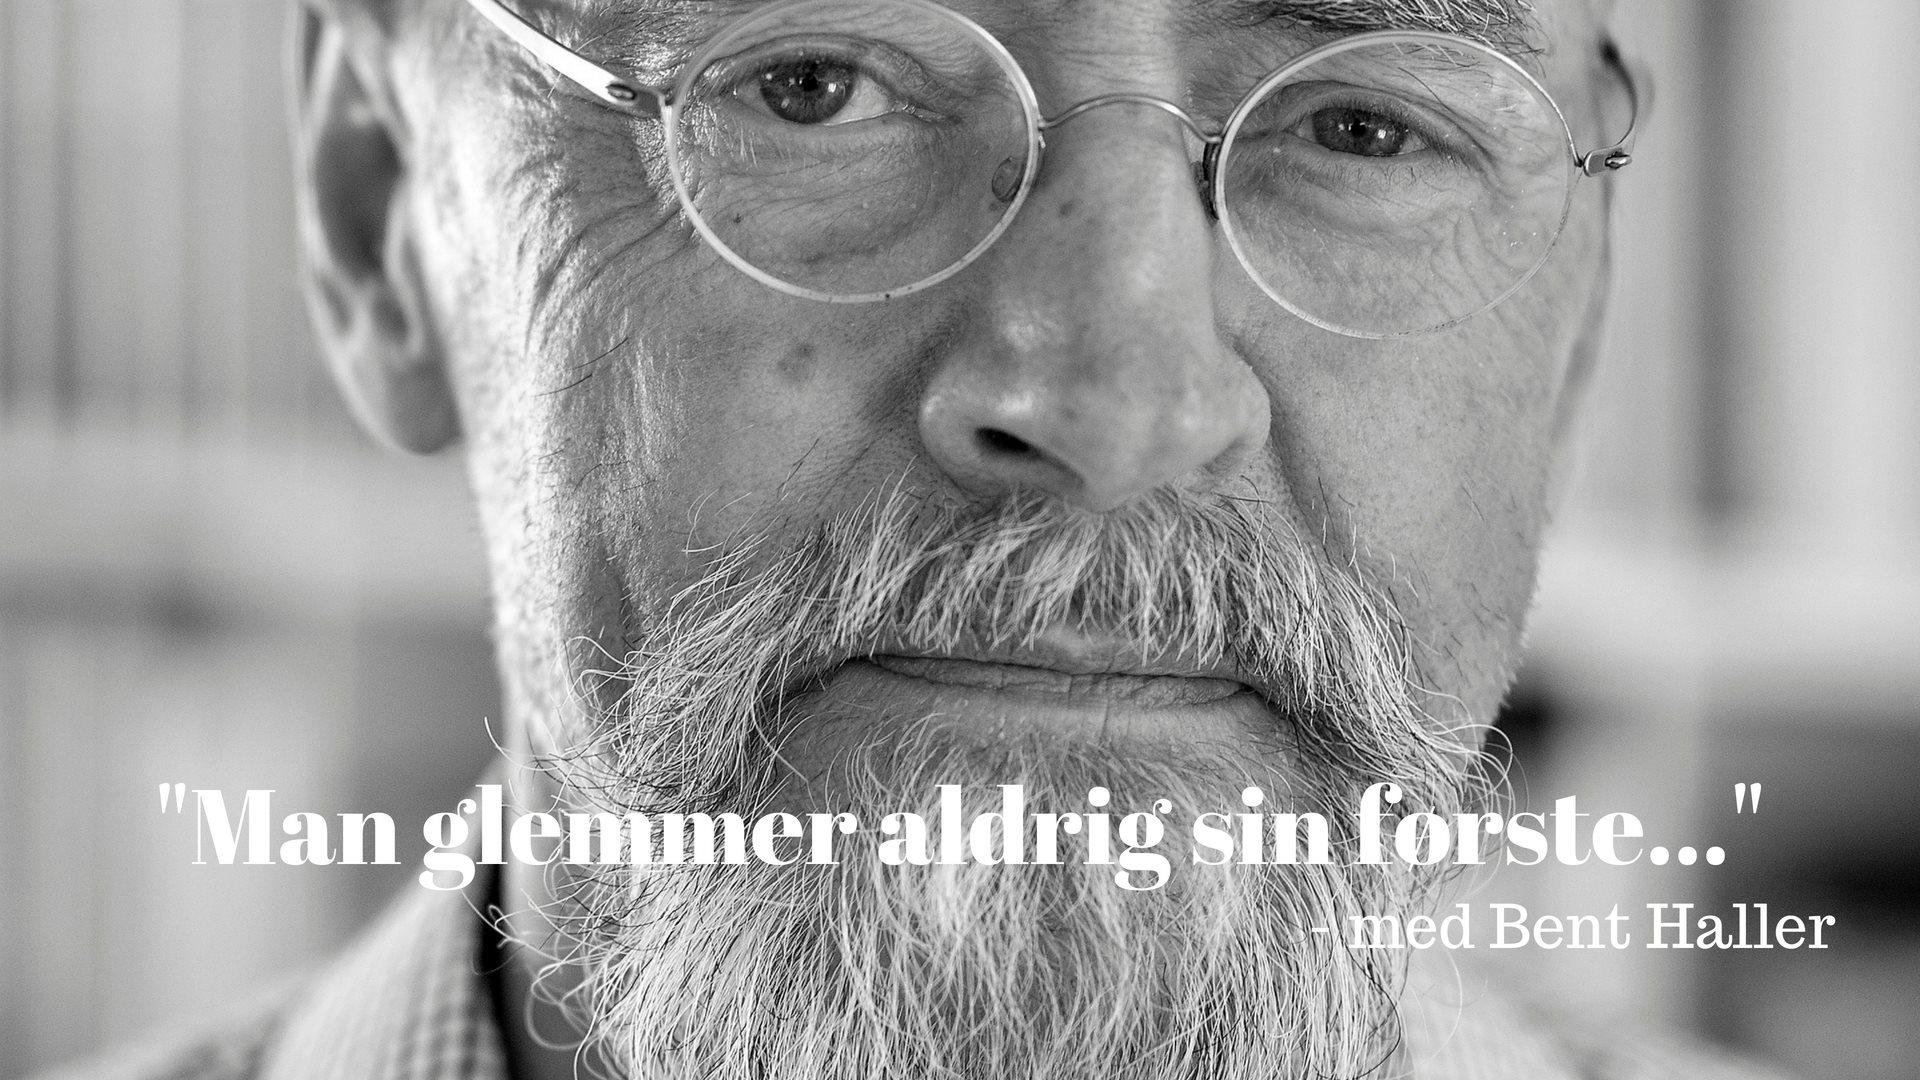 Bent Haller, Katamaranen, debut, debutroman, Man glemmer aldrig sin første